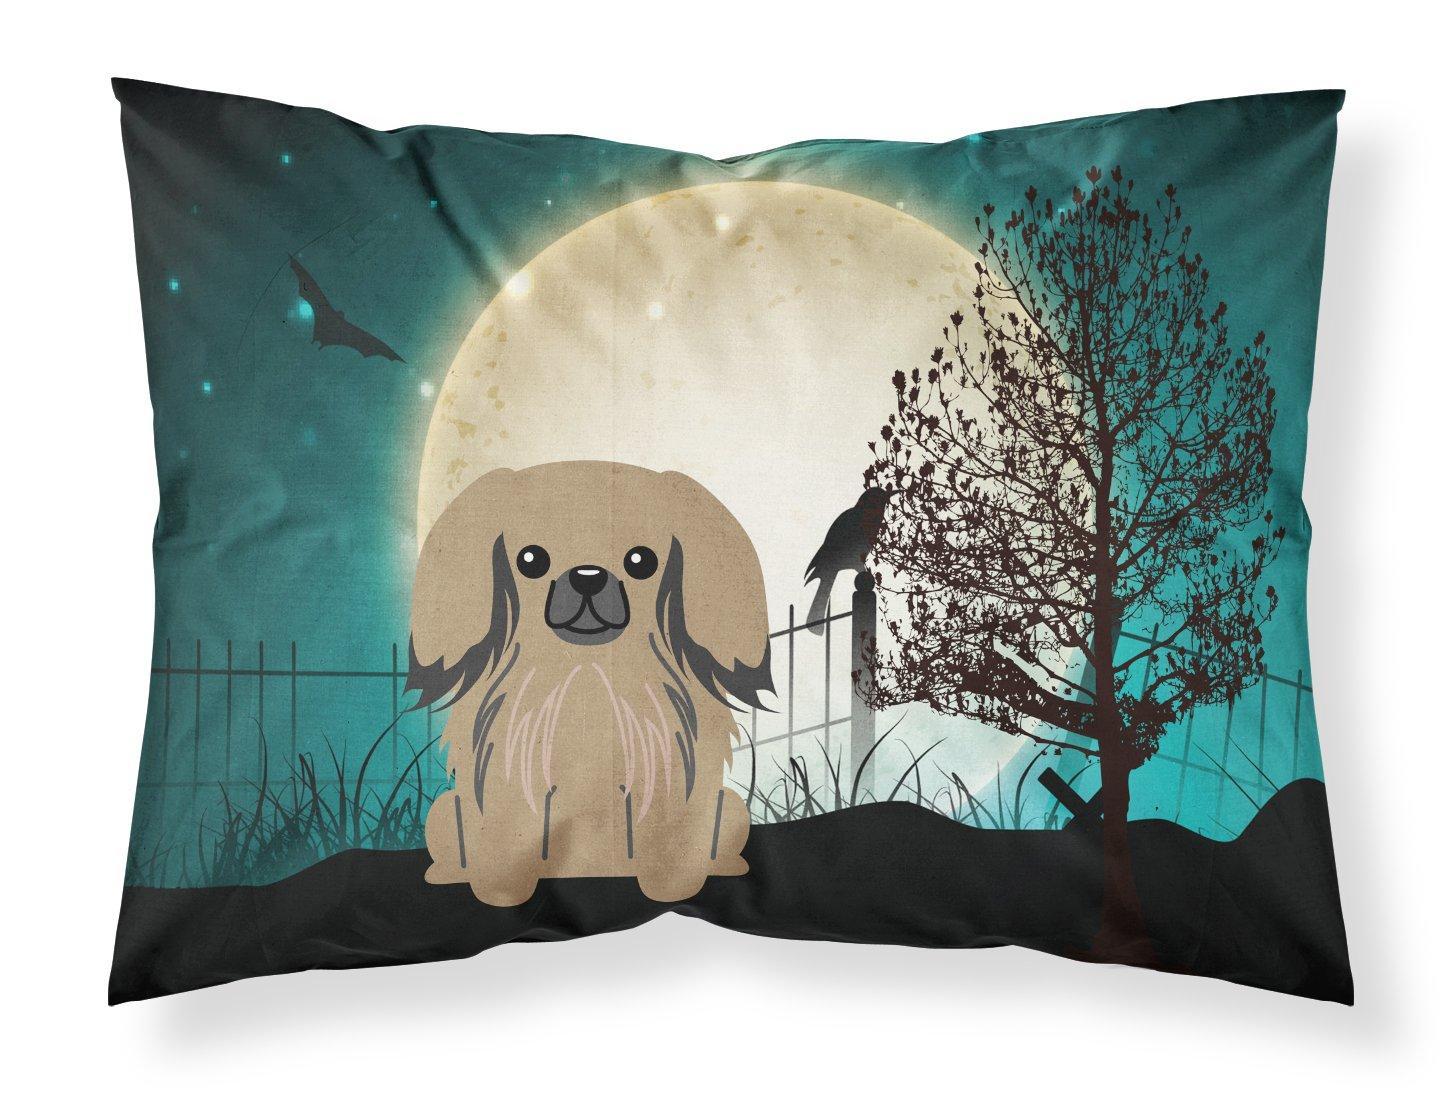 Carolines Treasures Halloween Scary Pekingnese Tan Fabric Standard Pillowcase BB2292PILLOWCASE Multicolor